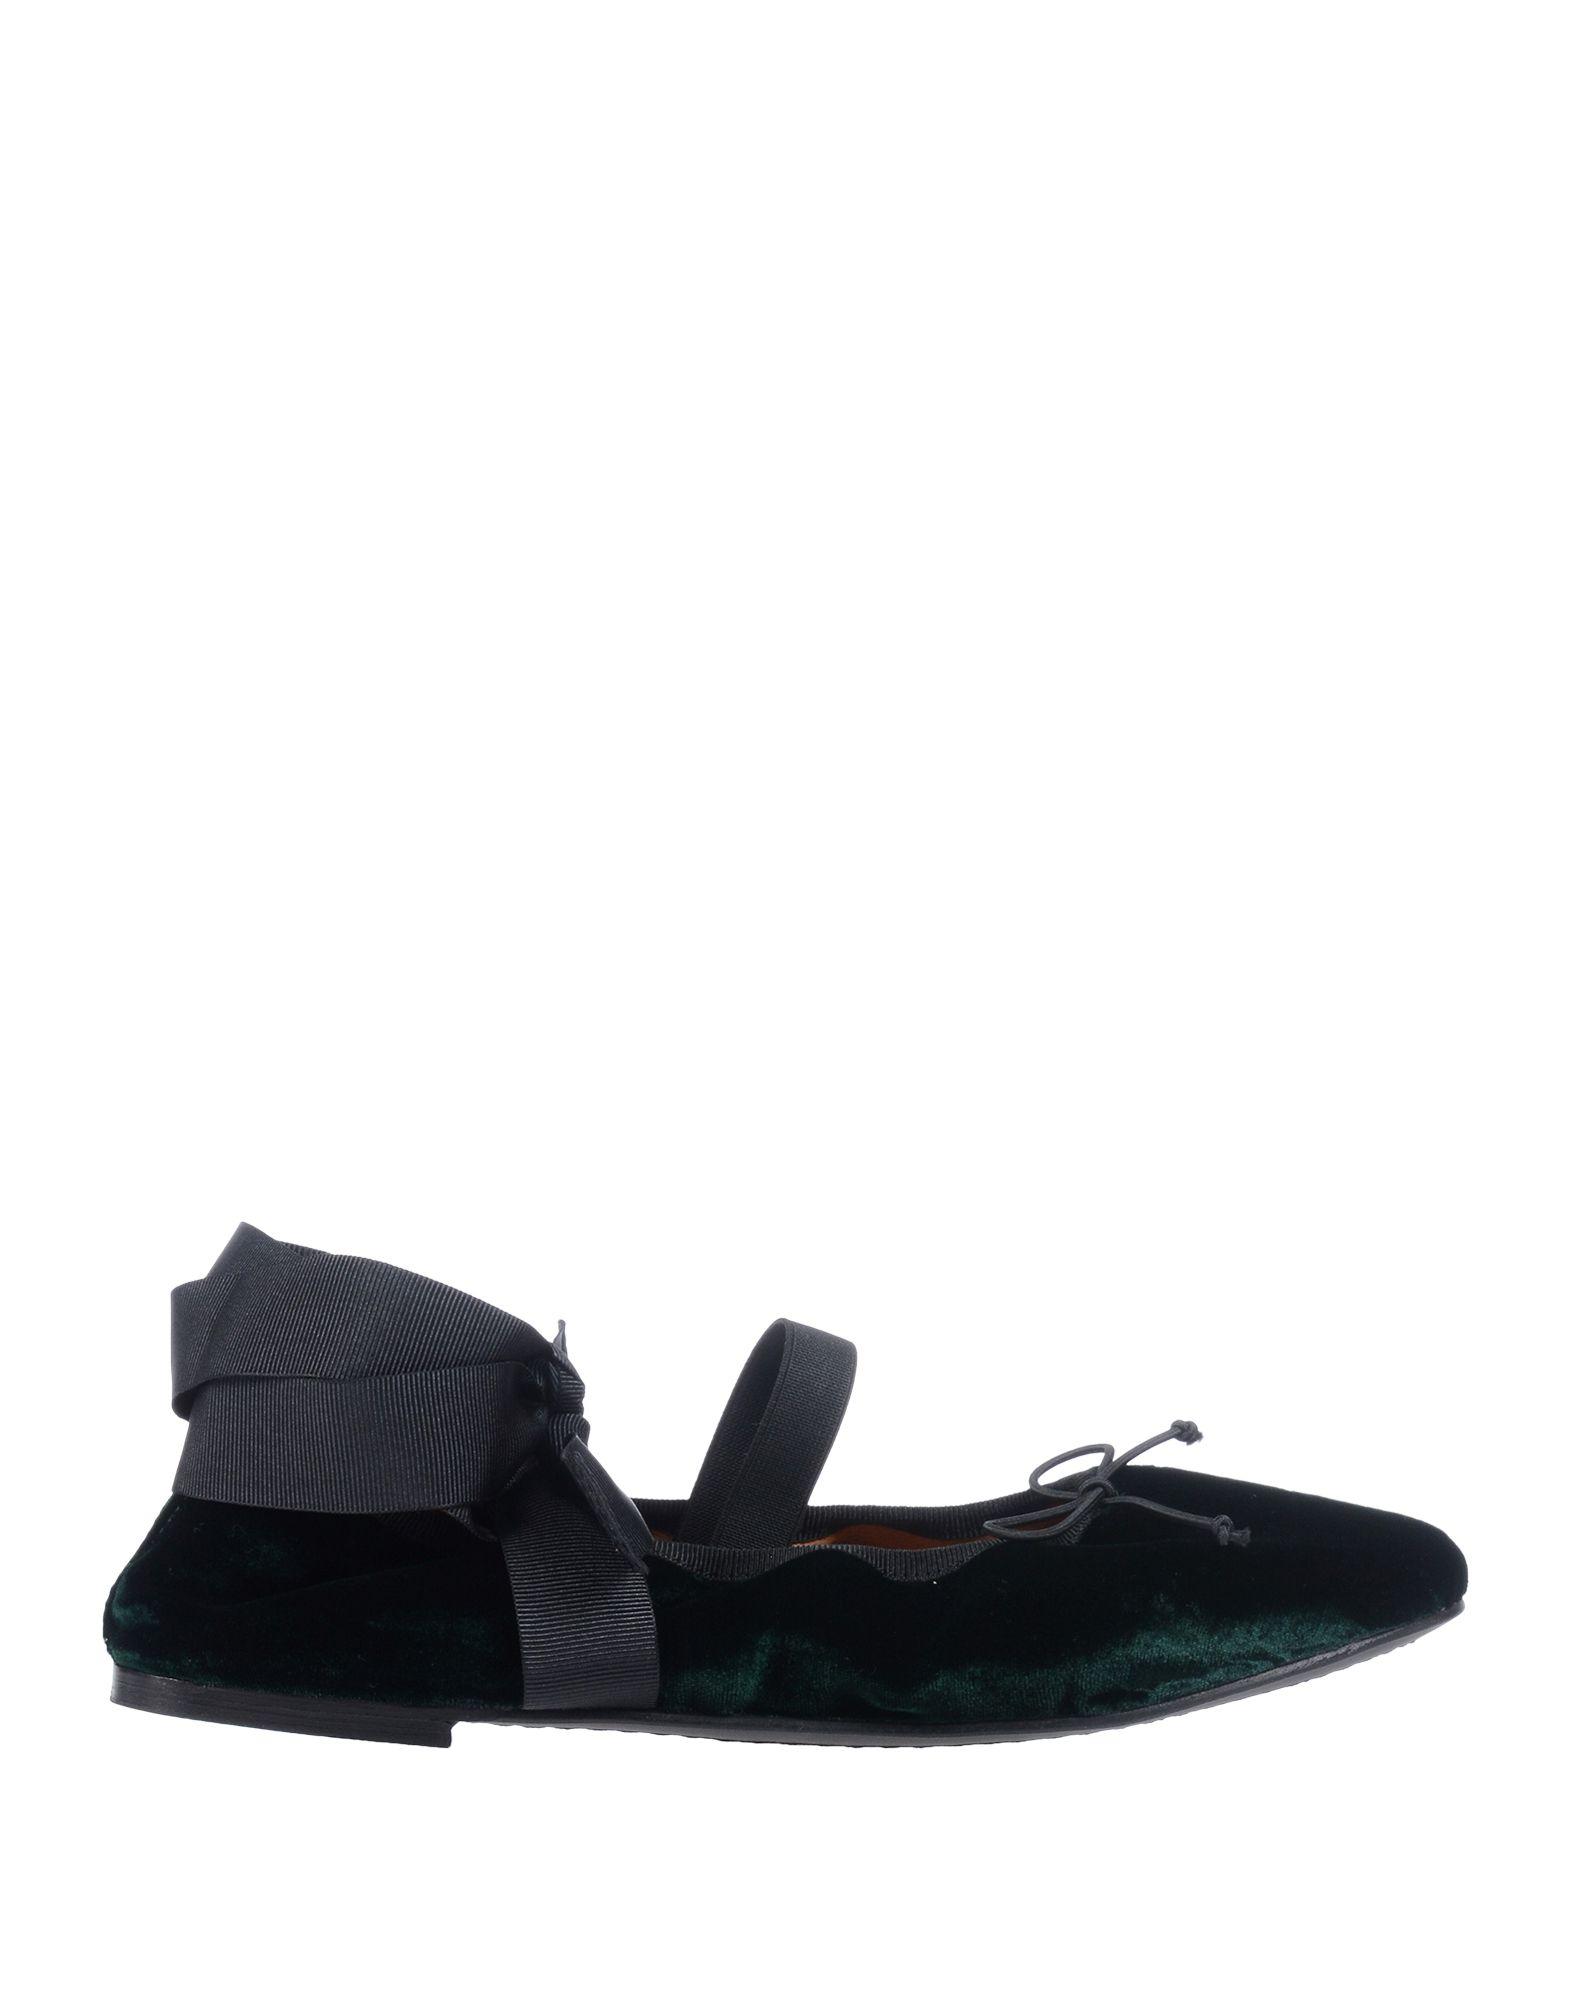 Stilvolle billige Schuhe Cross Walk Ballerinas Damen 11517701QI